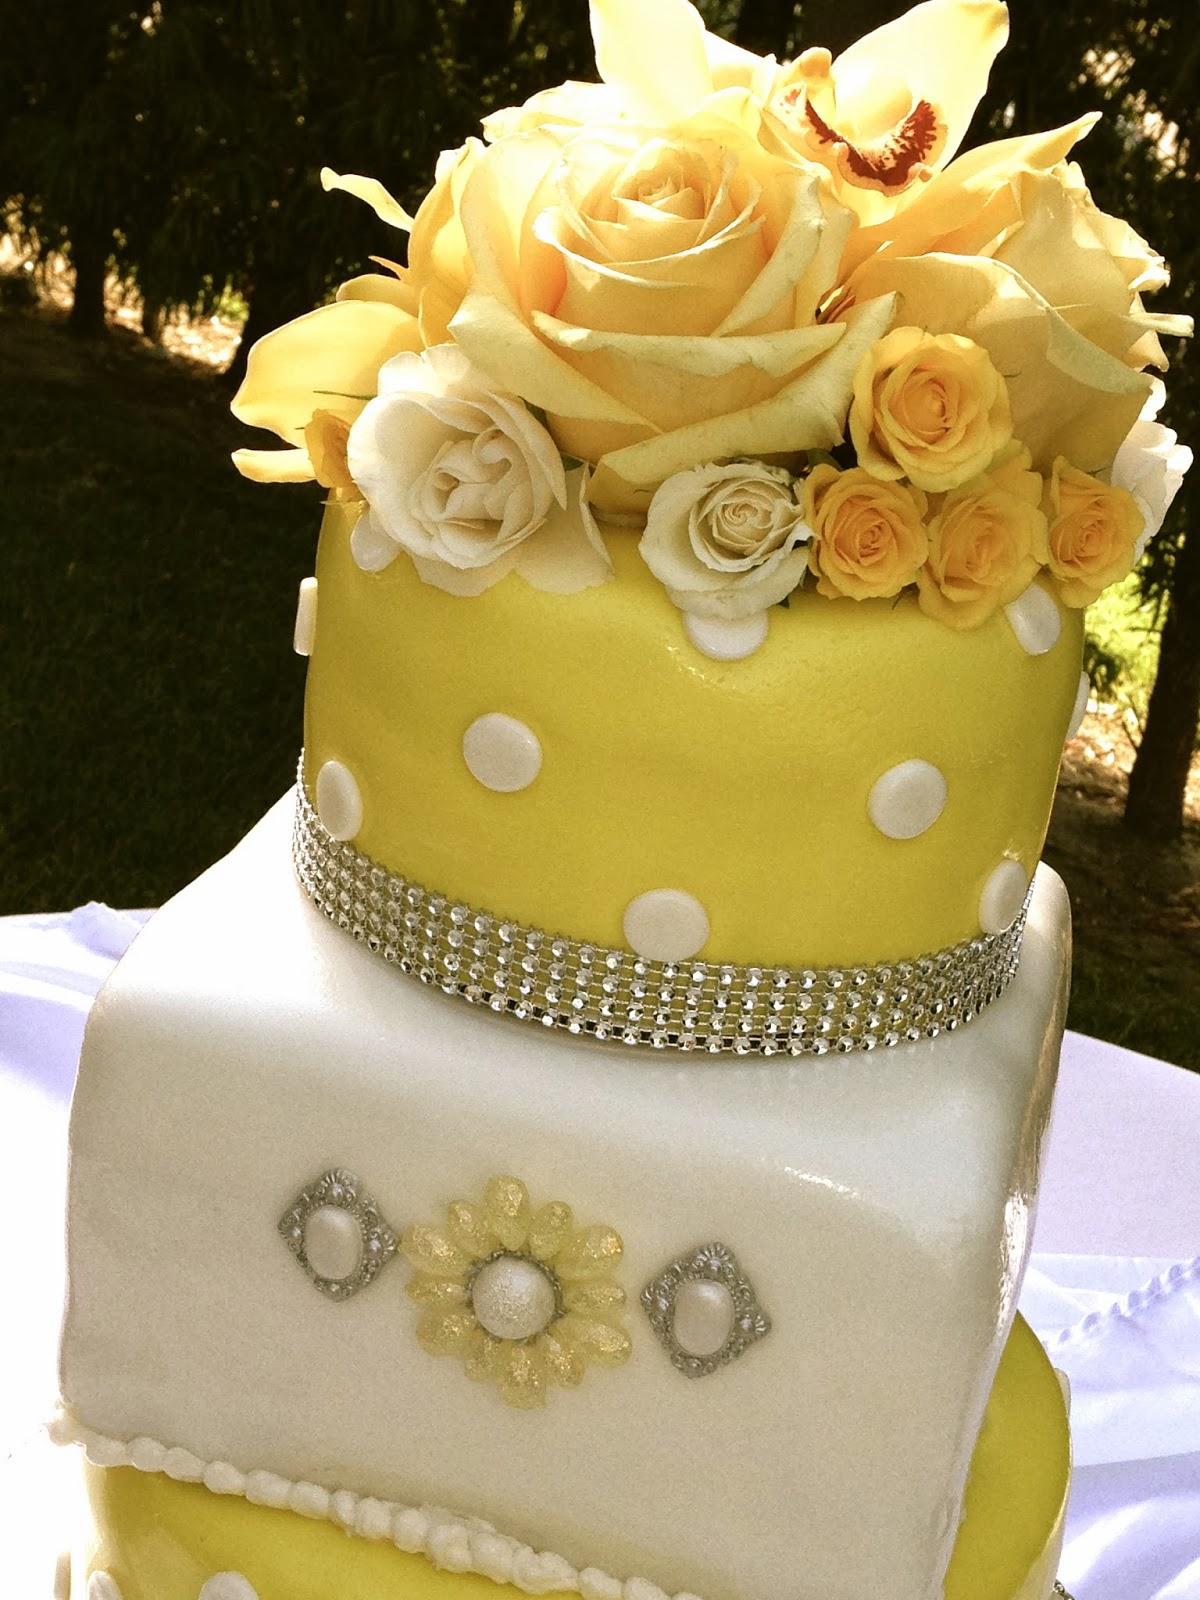 Plumeria Cake Studio: Yellow Polka Dot Wedding Cake and Treats